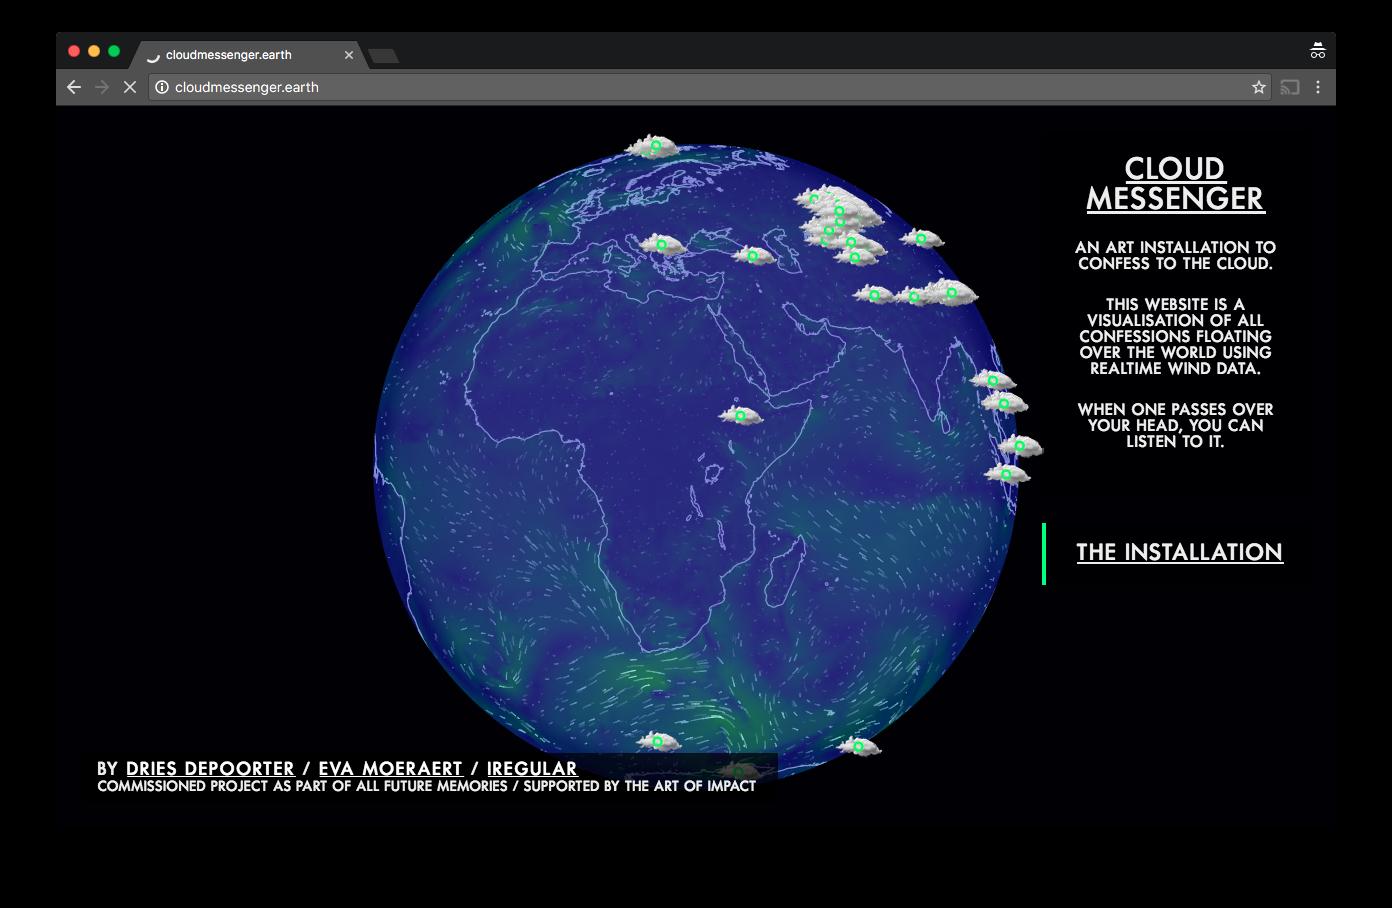 dries-depoorter-cloud-messenger-website-01